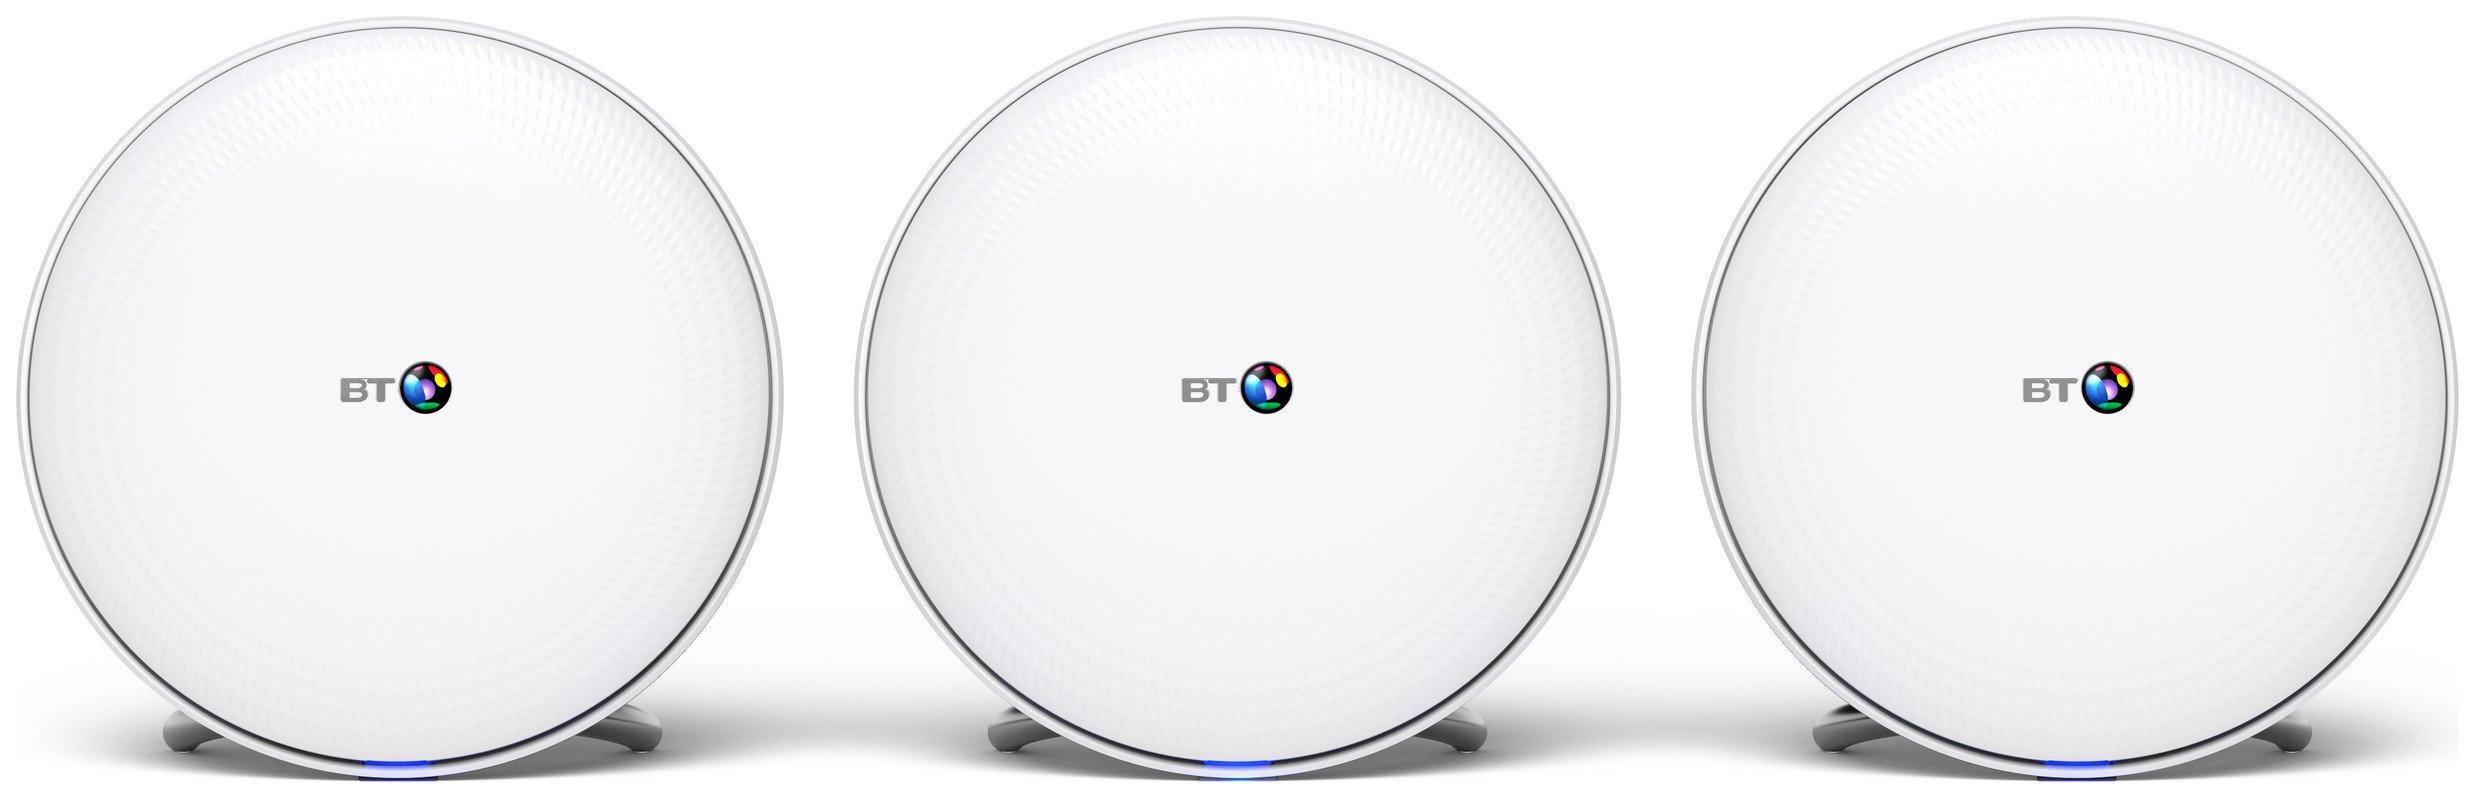 BT Whole Home Wi-Fi Triple Pack